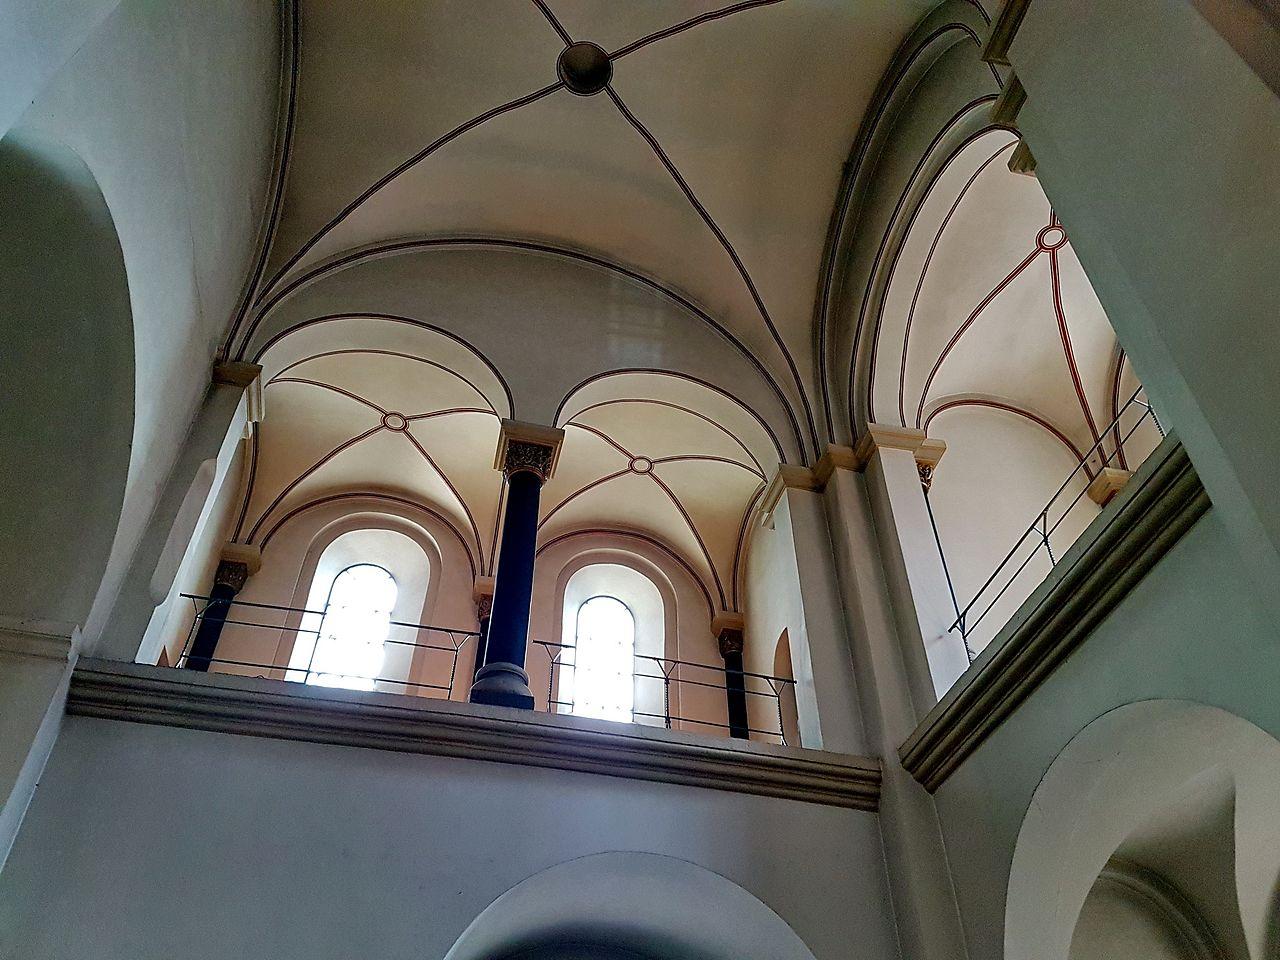 Bestand 2016 westwerk st servaasbasiliek interieur for Interieur wikipedia